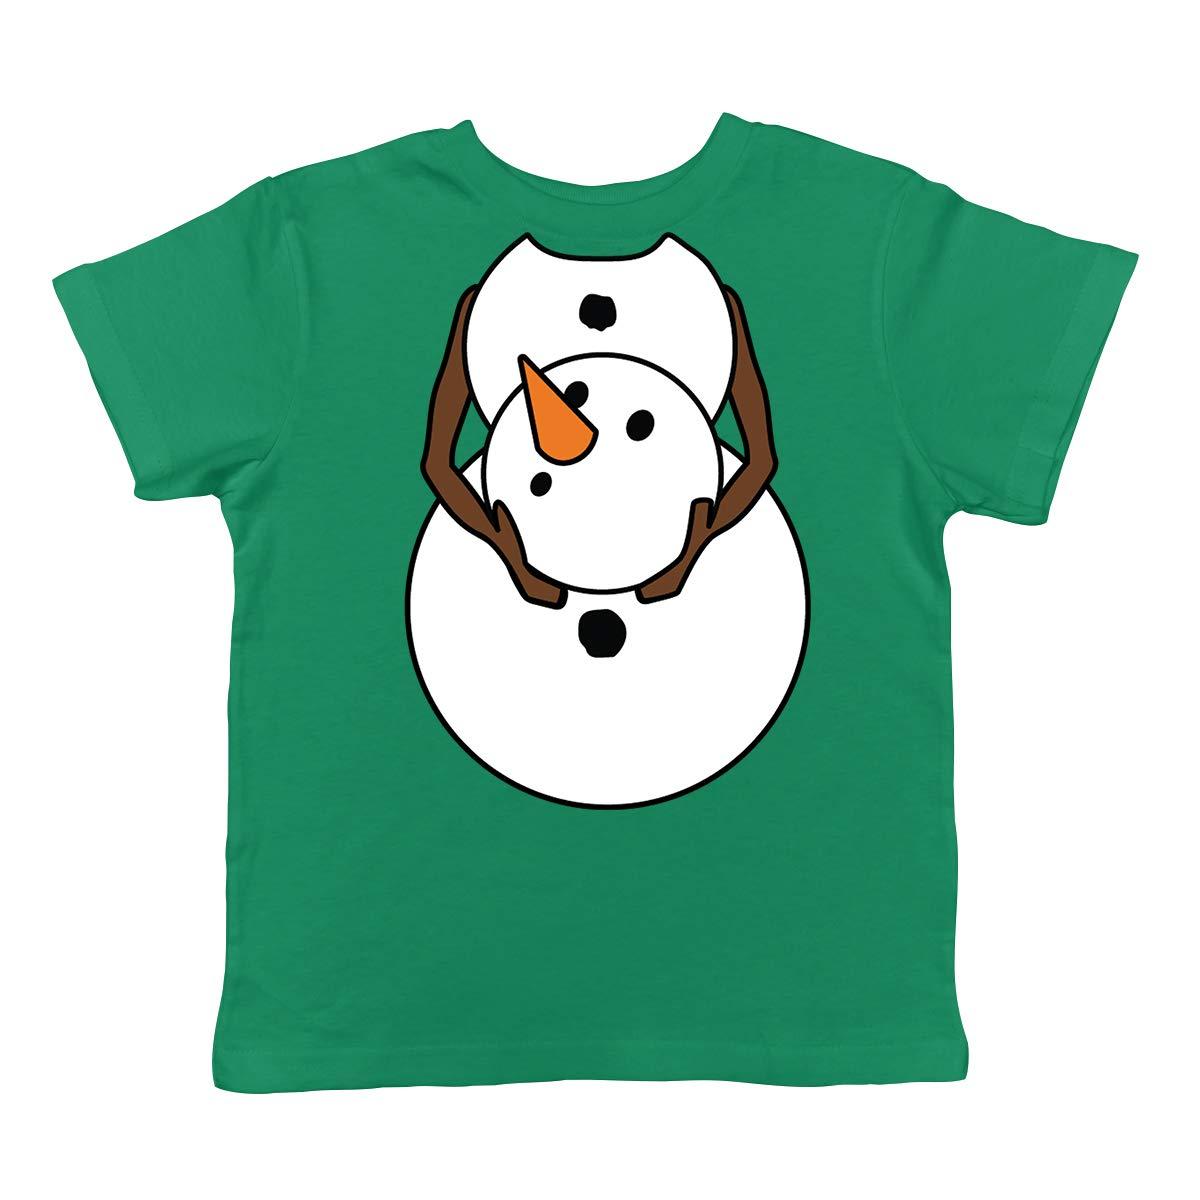 SpiritForged Apparel Snowman Costume Infant T-Shirt